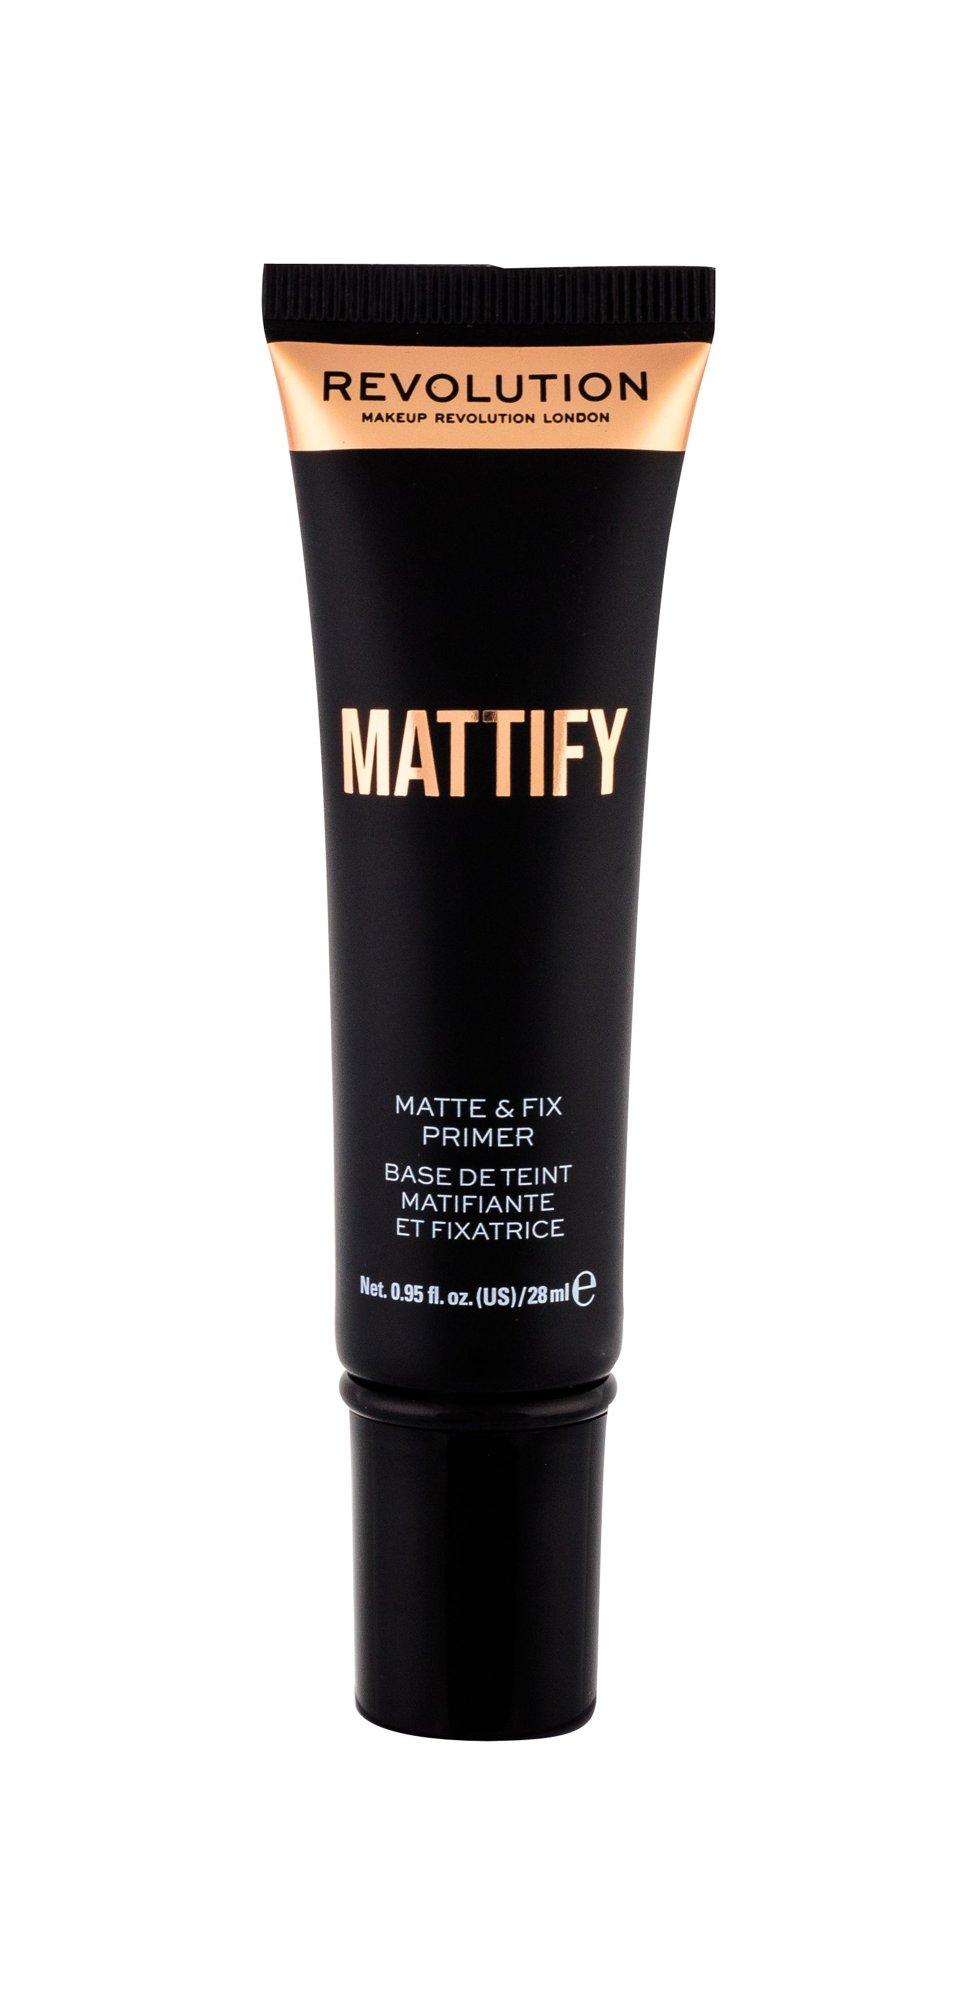 Makeup Revolution London Mattify Makeup Primer 28ml